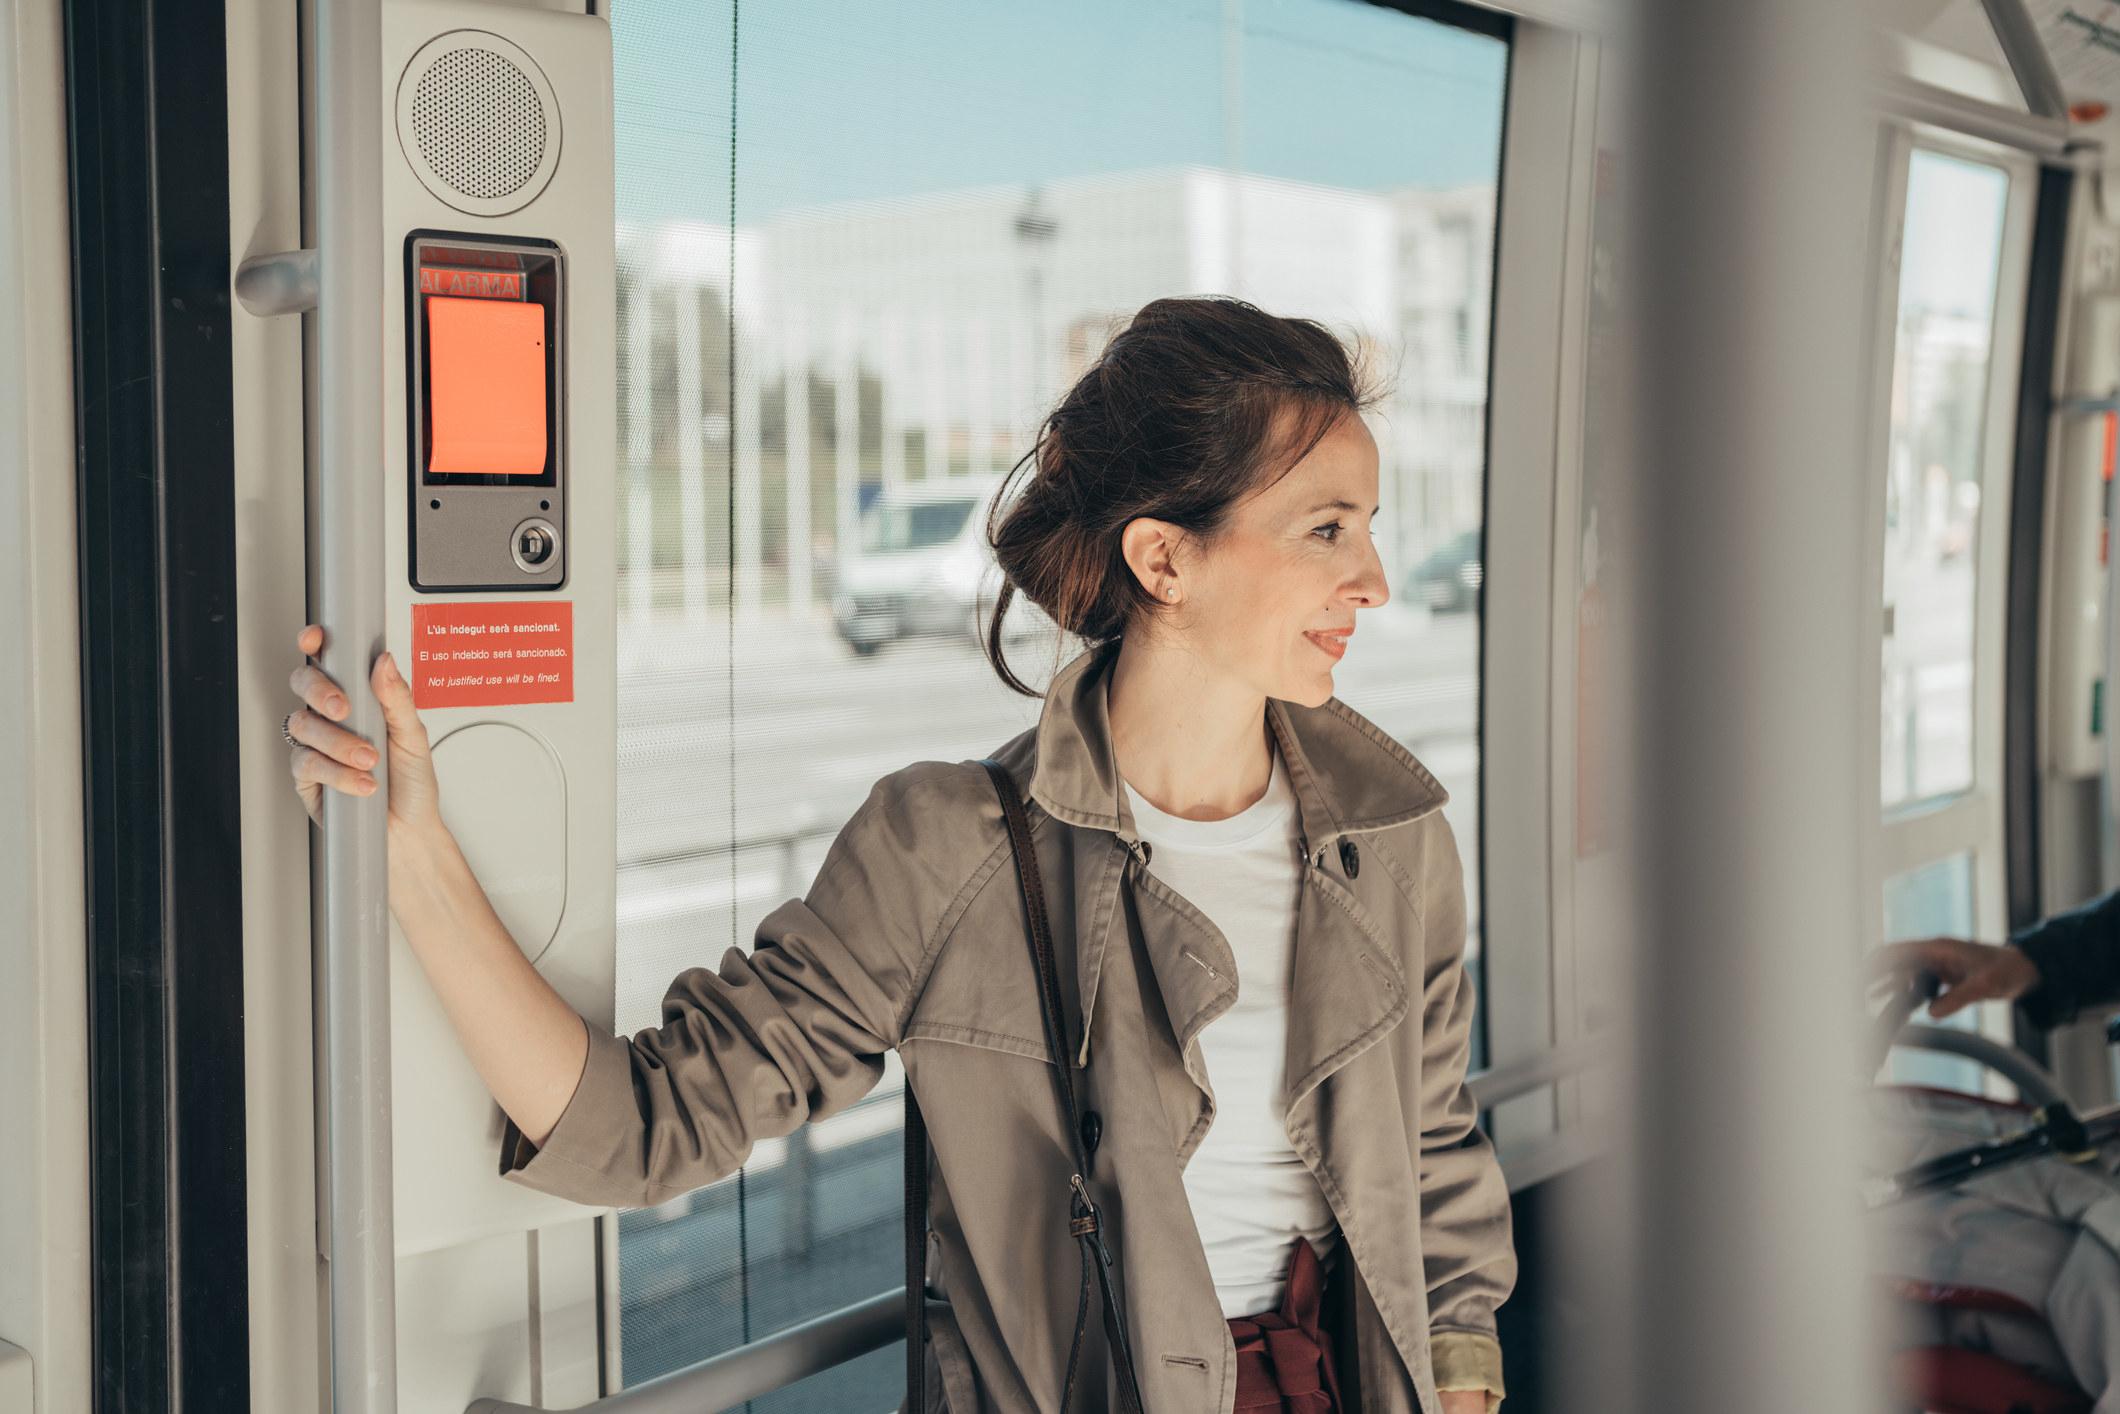 A woman riding public transportation.